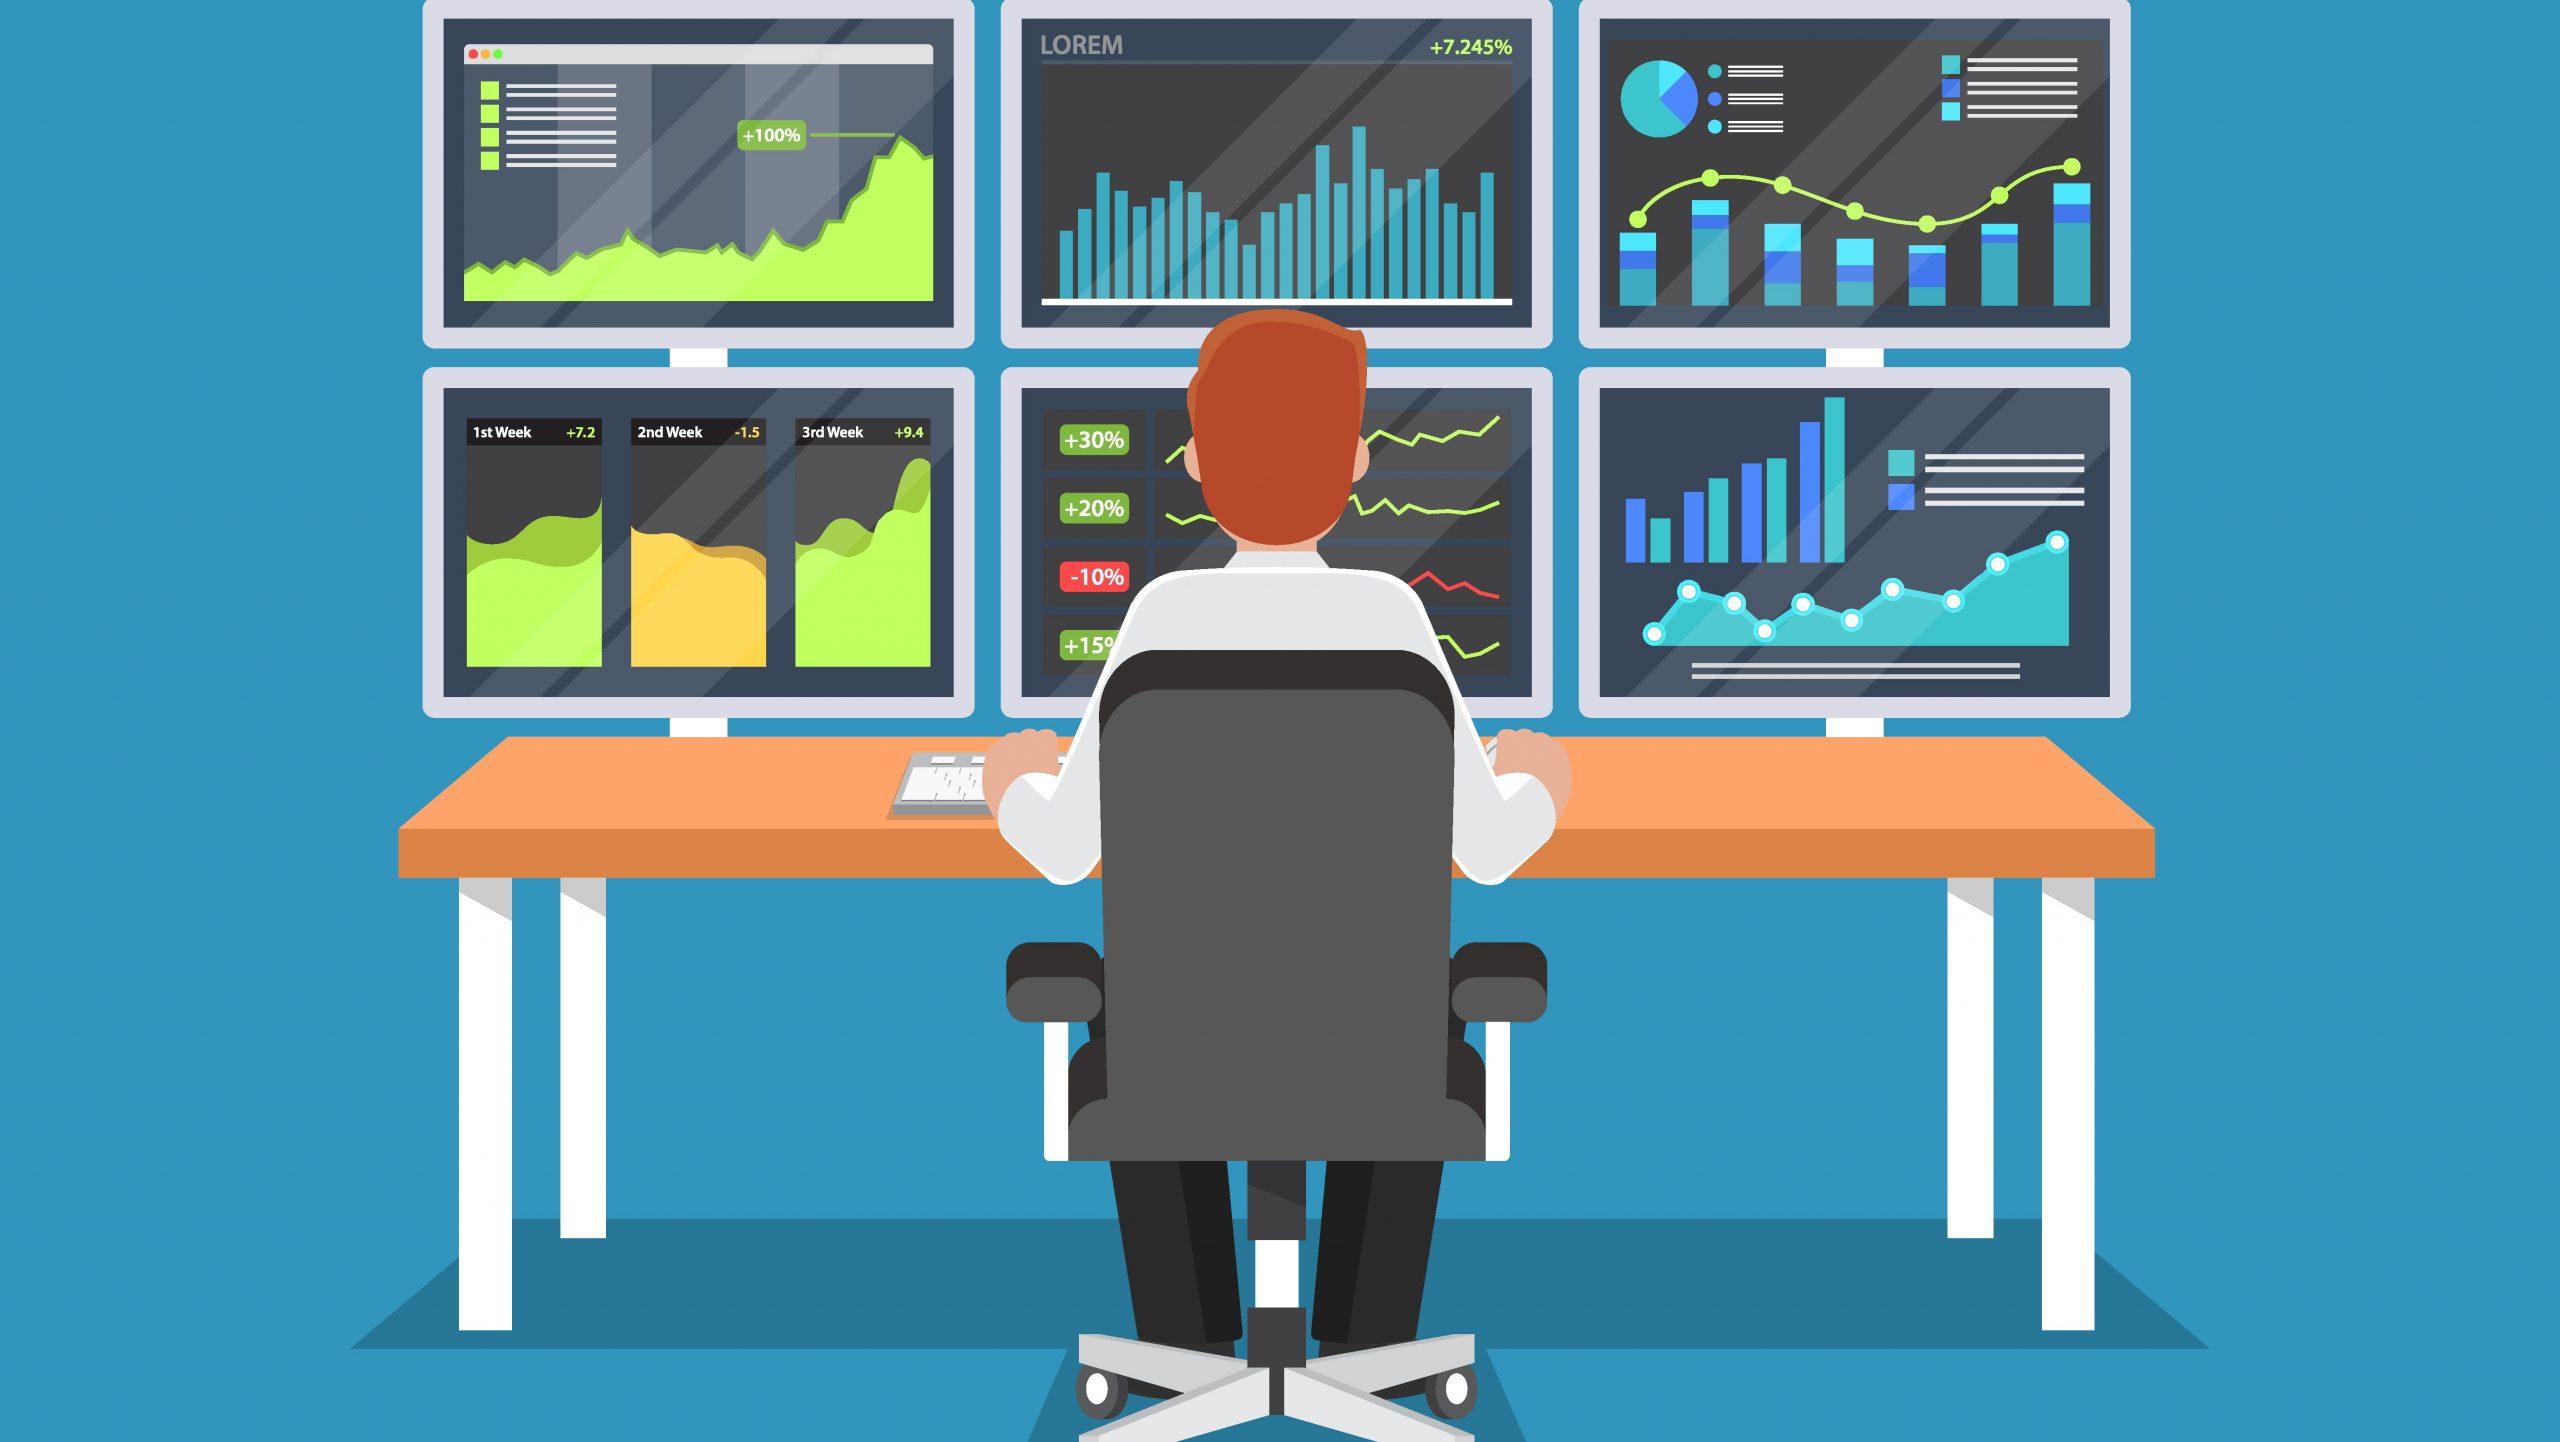 Monitoring custom metrics with Netreo